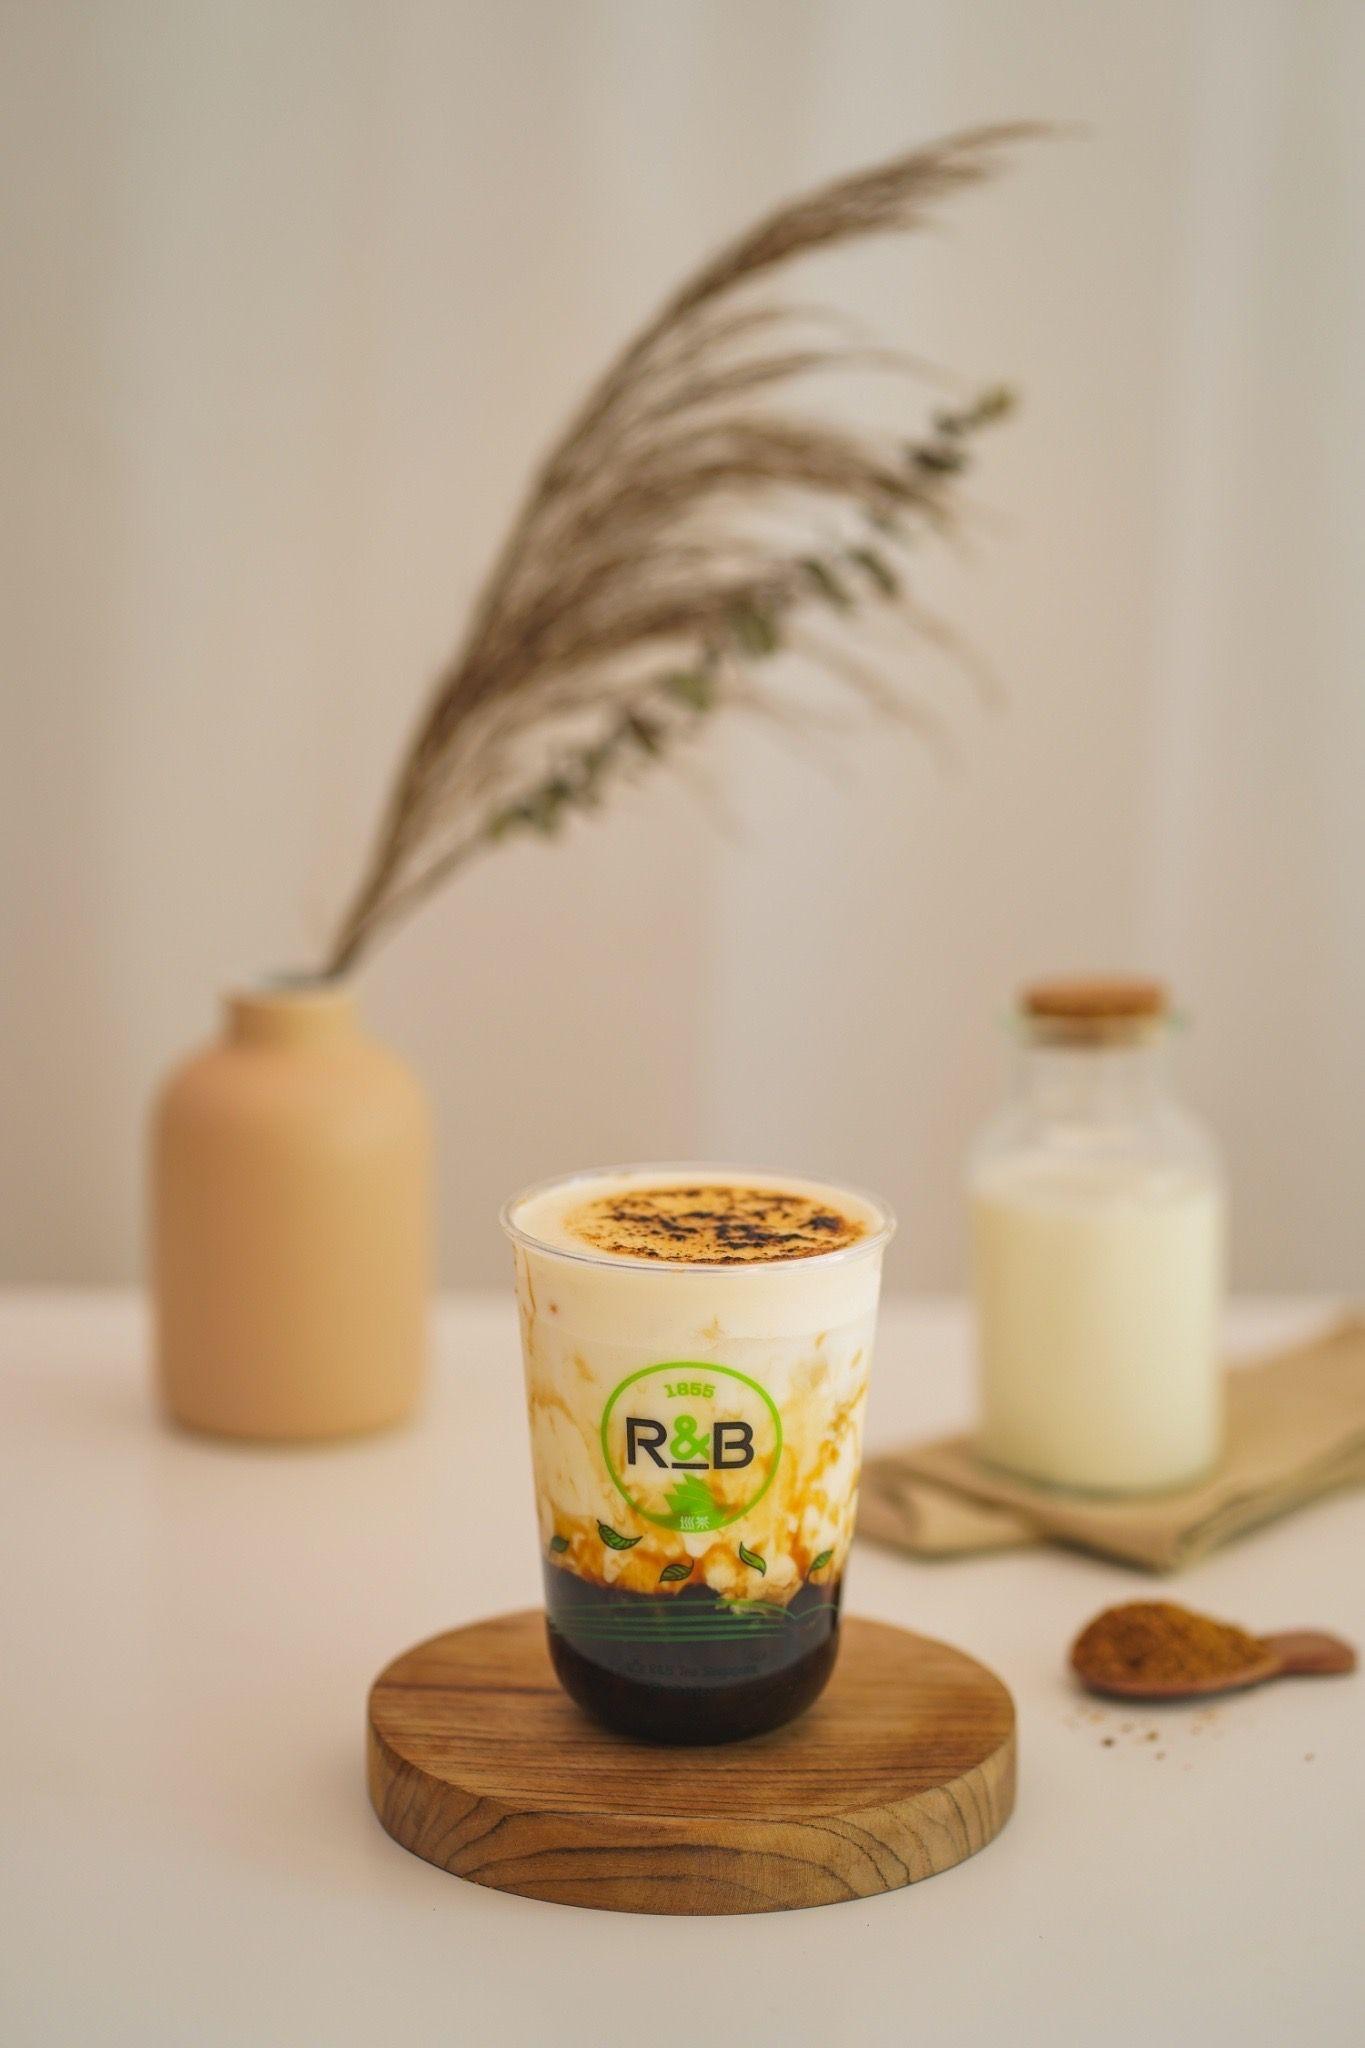 R&B Tea Hadir di Indonesia